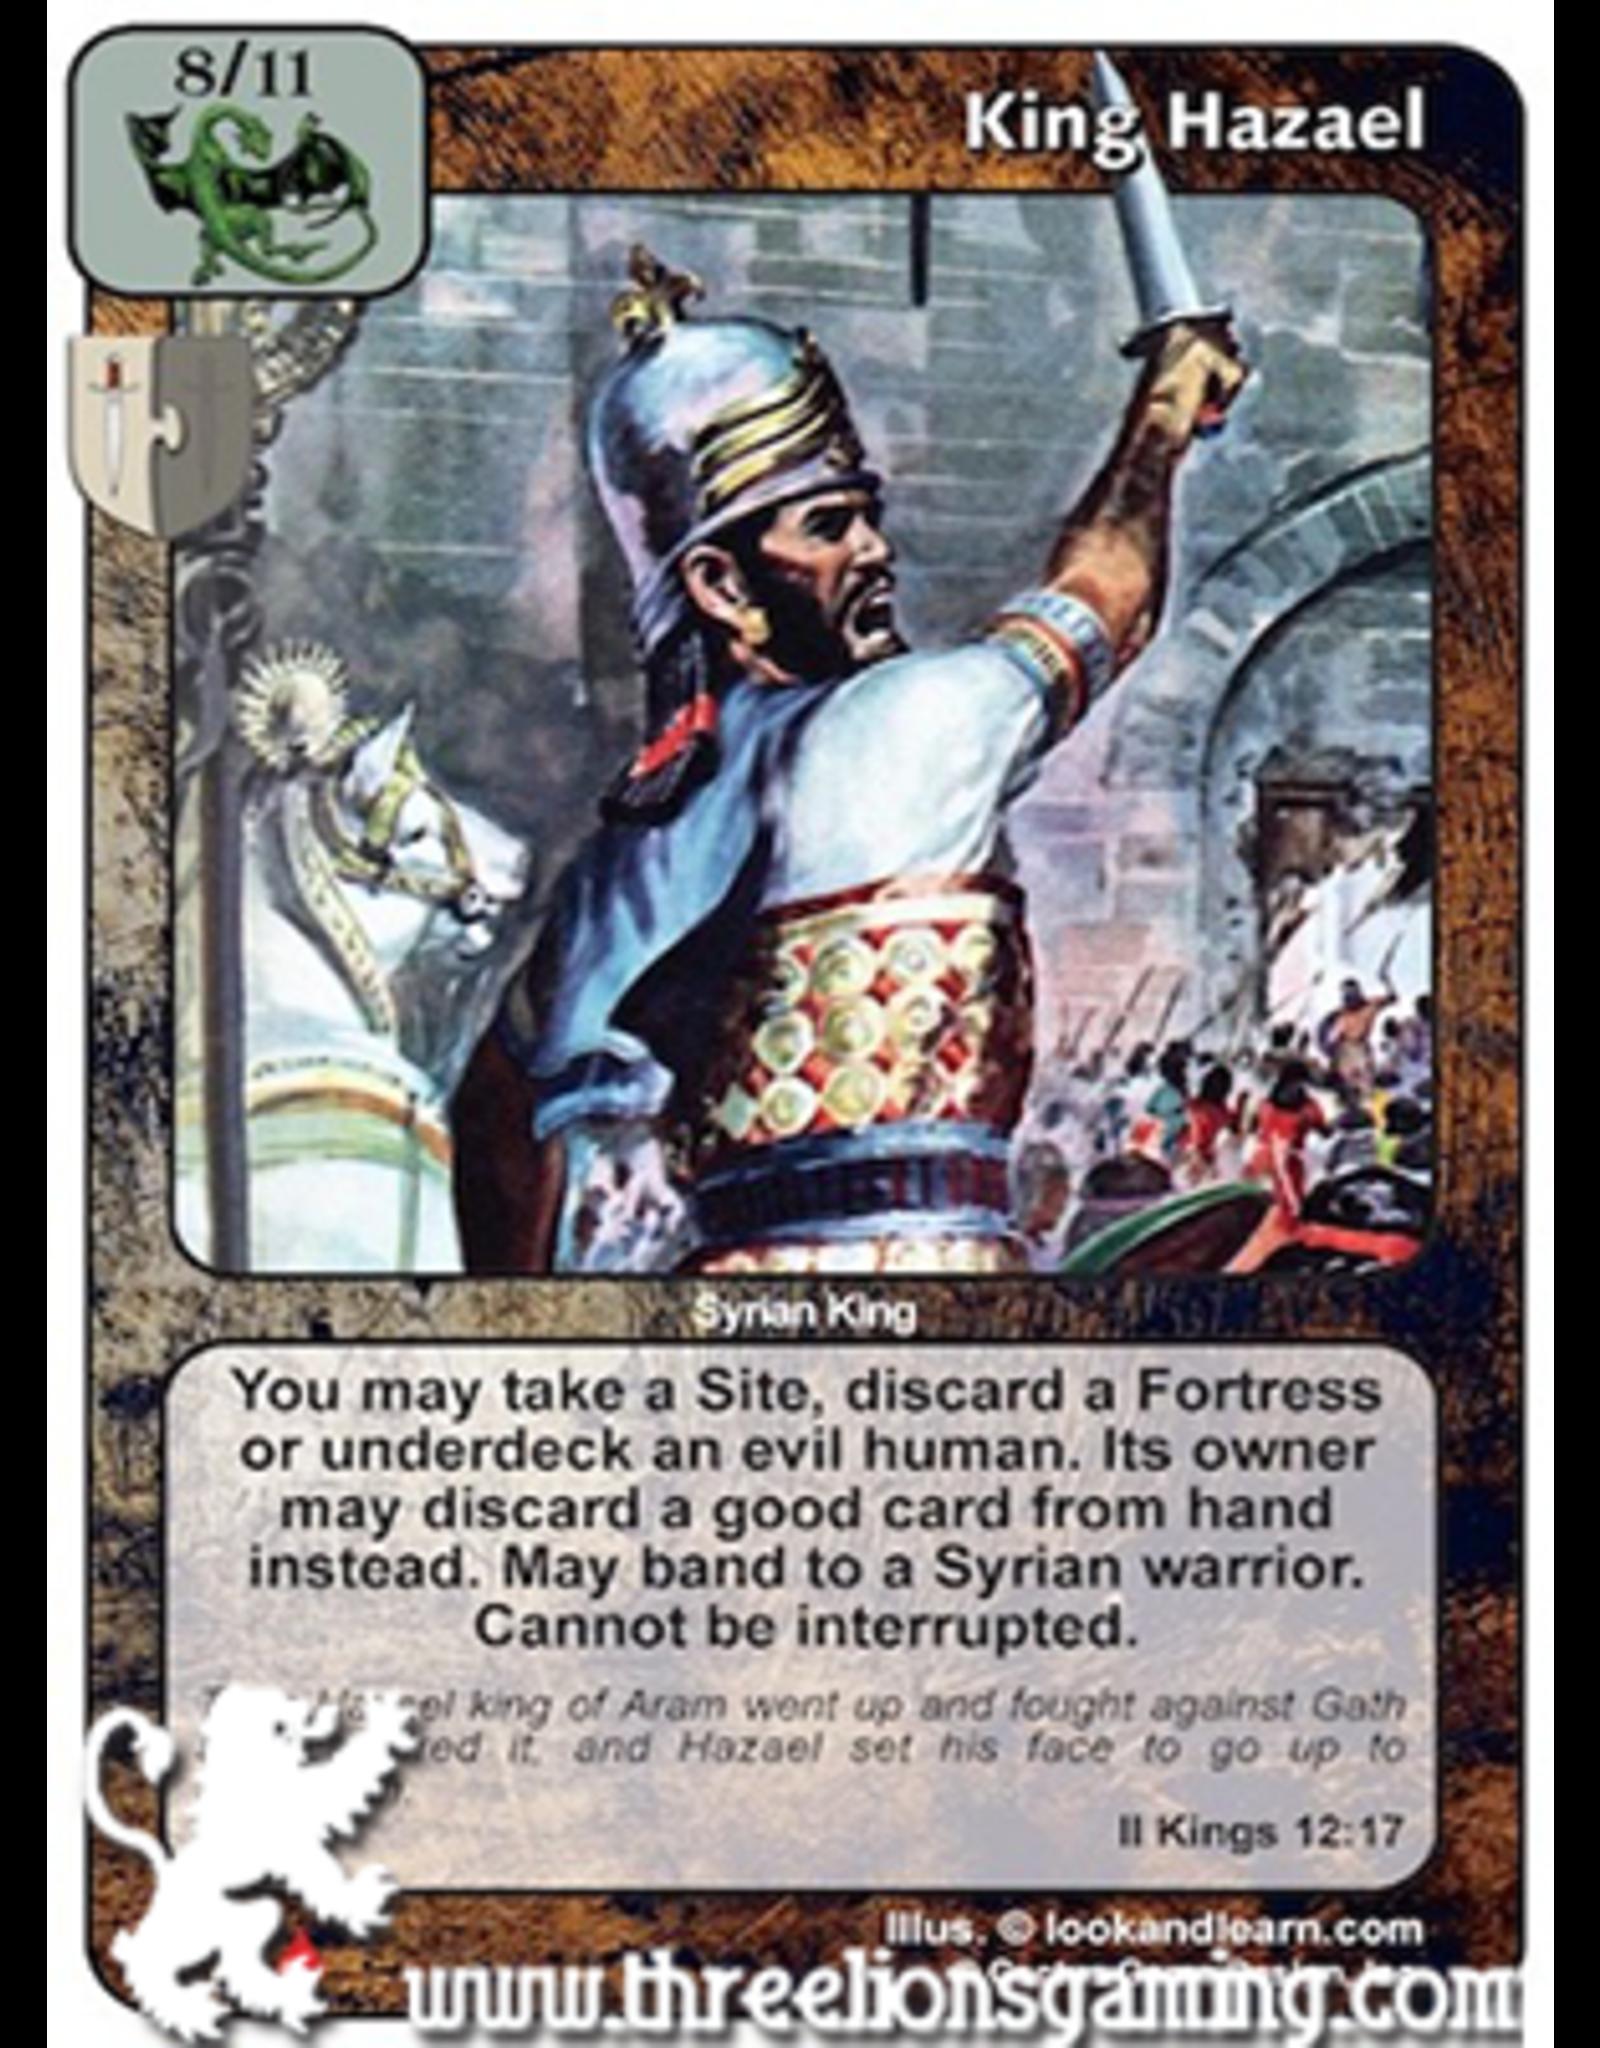 LoC: King Hazael